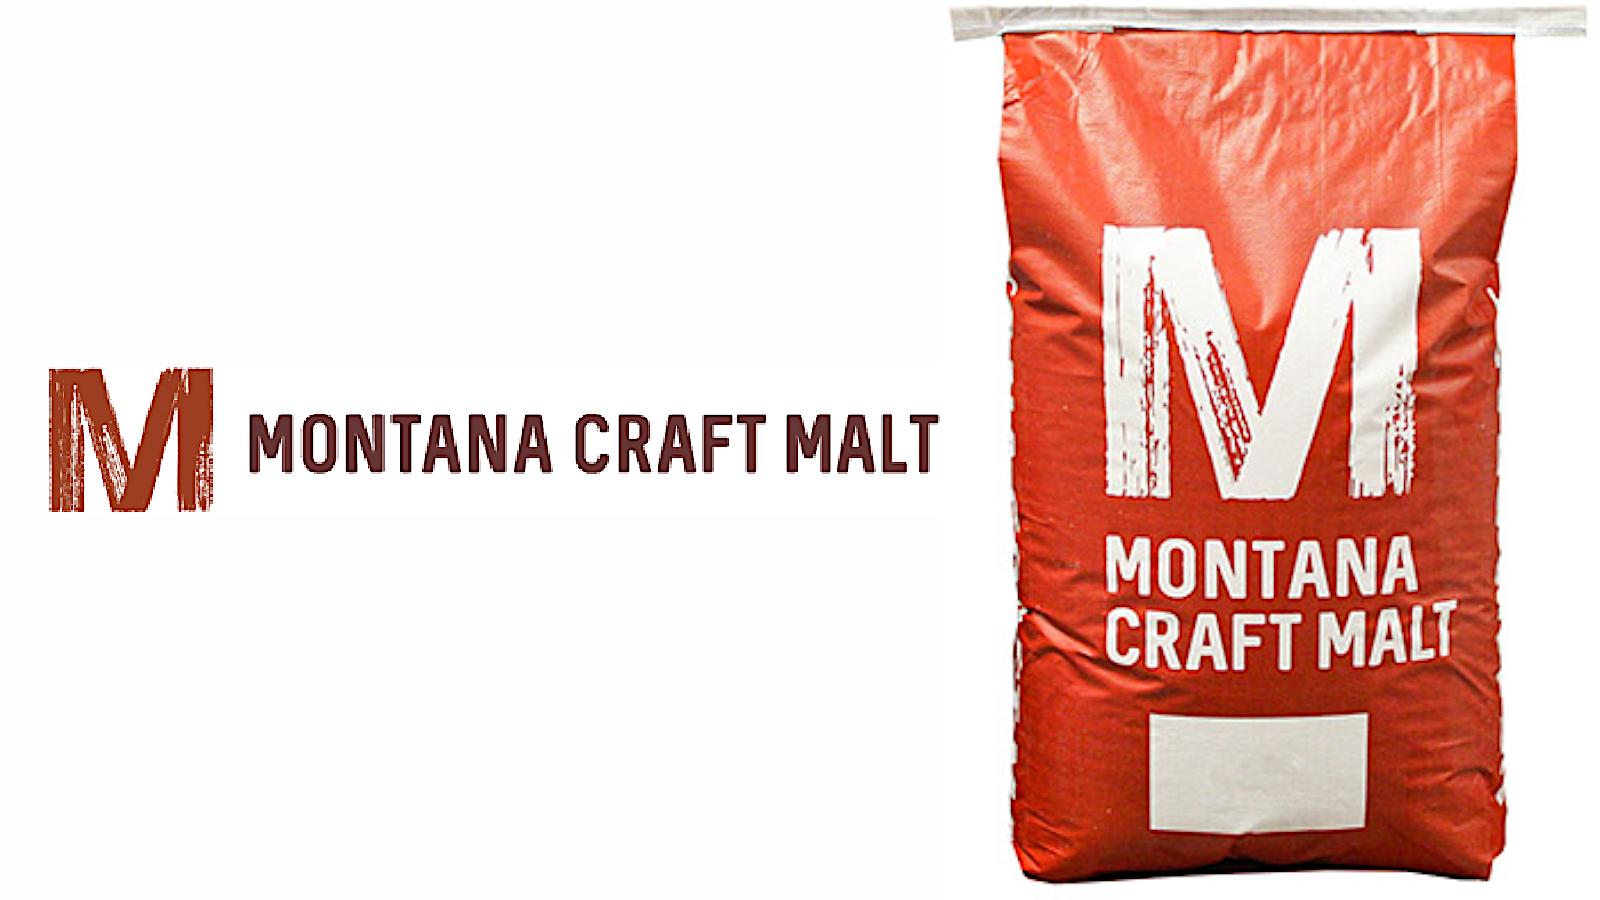 Montana Craft Malt